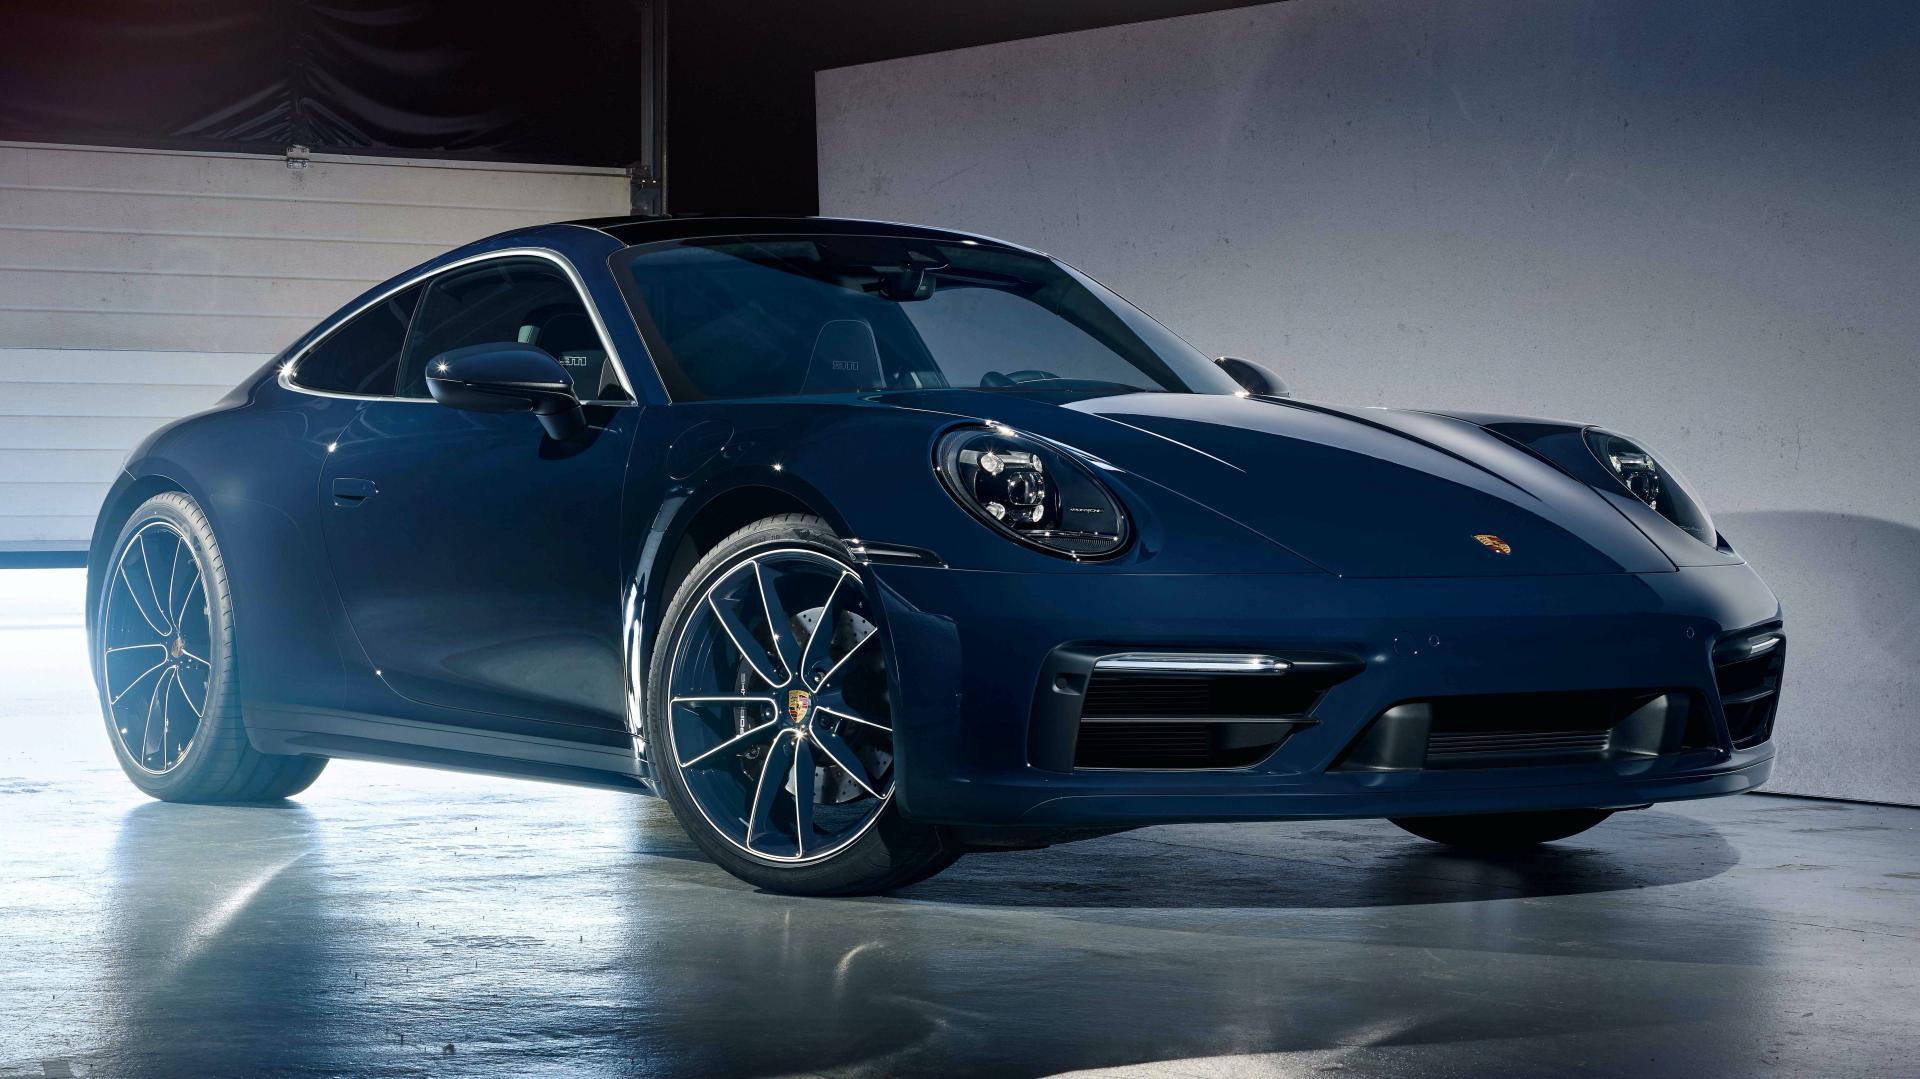 Porsche-911-Belgian-Legend-Edition-2020-Jacky-Ickx-8